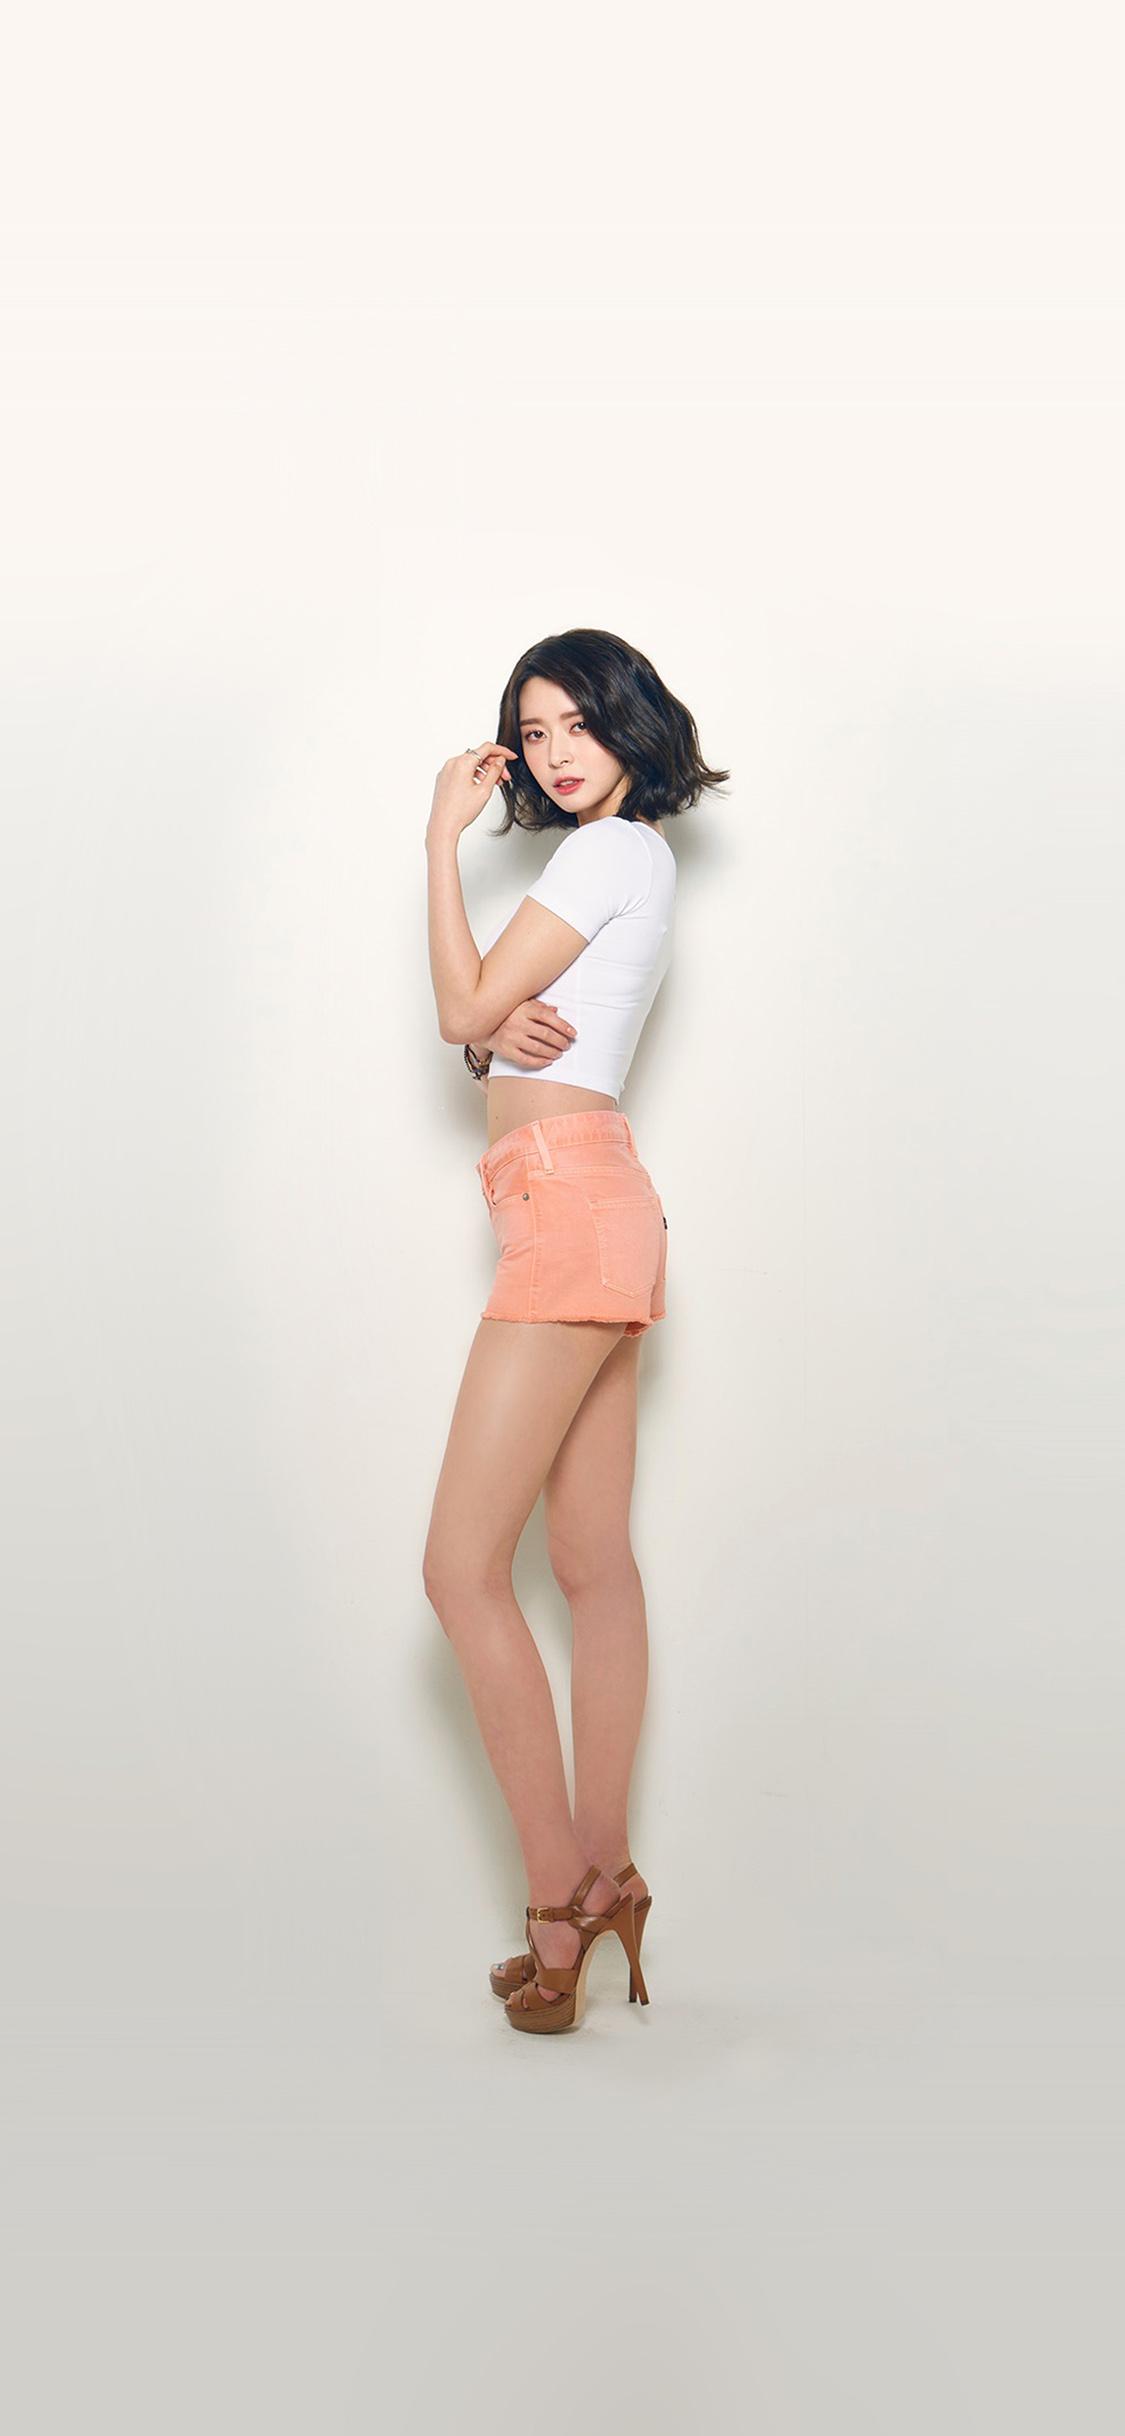 iPhoneXpapers.com-Apple-iPhone-wallpaper-hj49-kpop-girl-group-kwon-nara-hellovenus